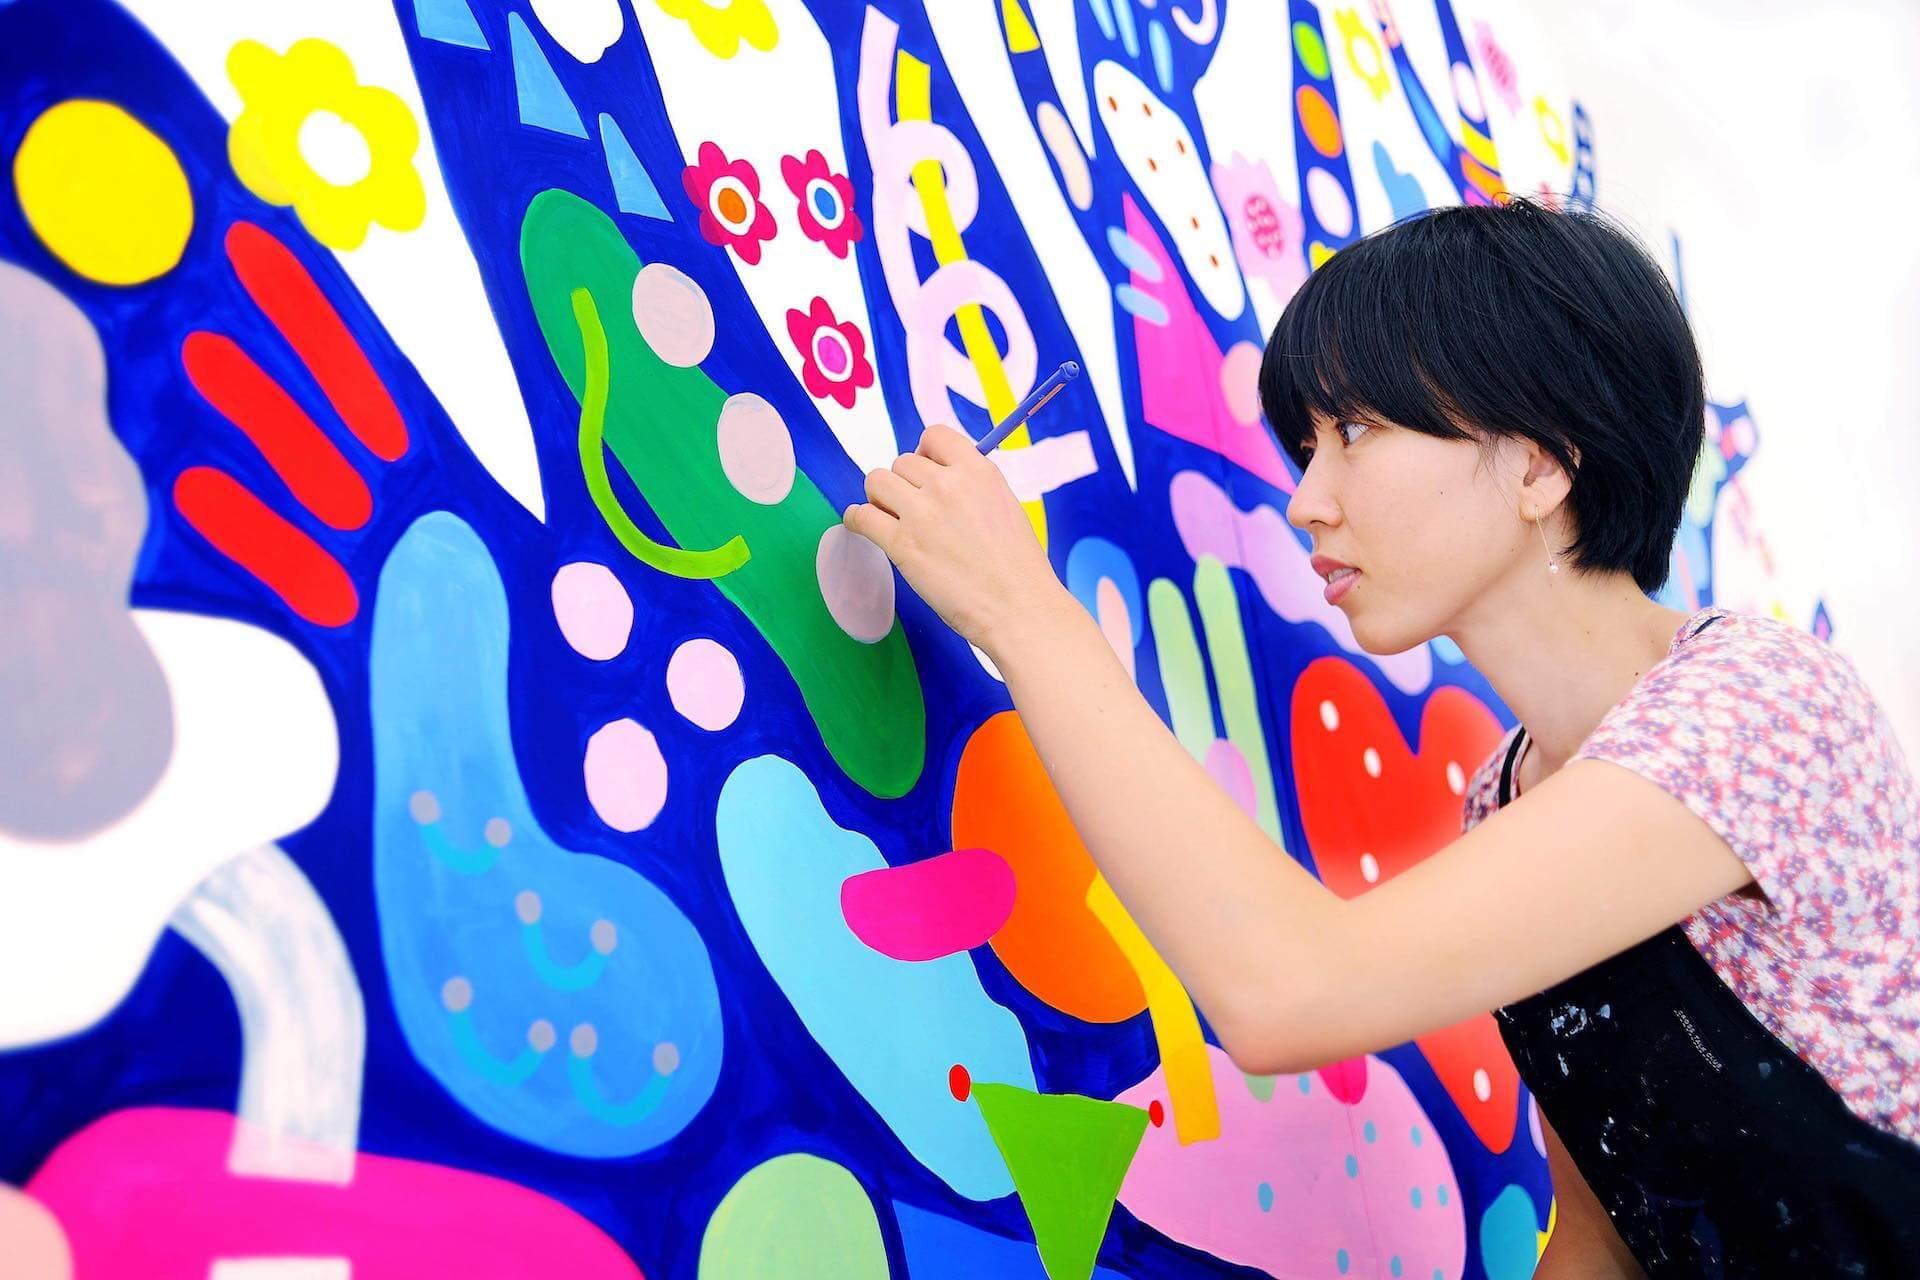 BnA Alter Museumホテル開業2周年記念!アートルーム制作に参加したアーティストによるグループ展が開催 art210419_bnaaltermuseum-210419_5